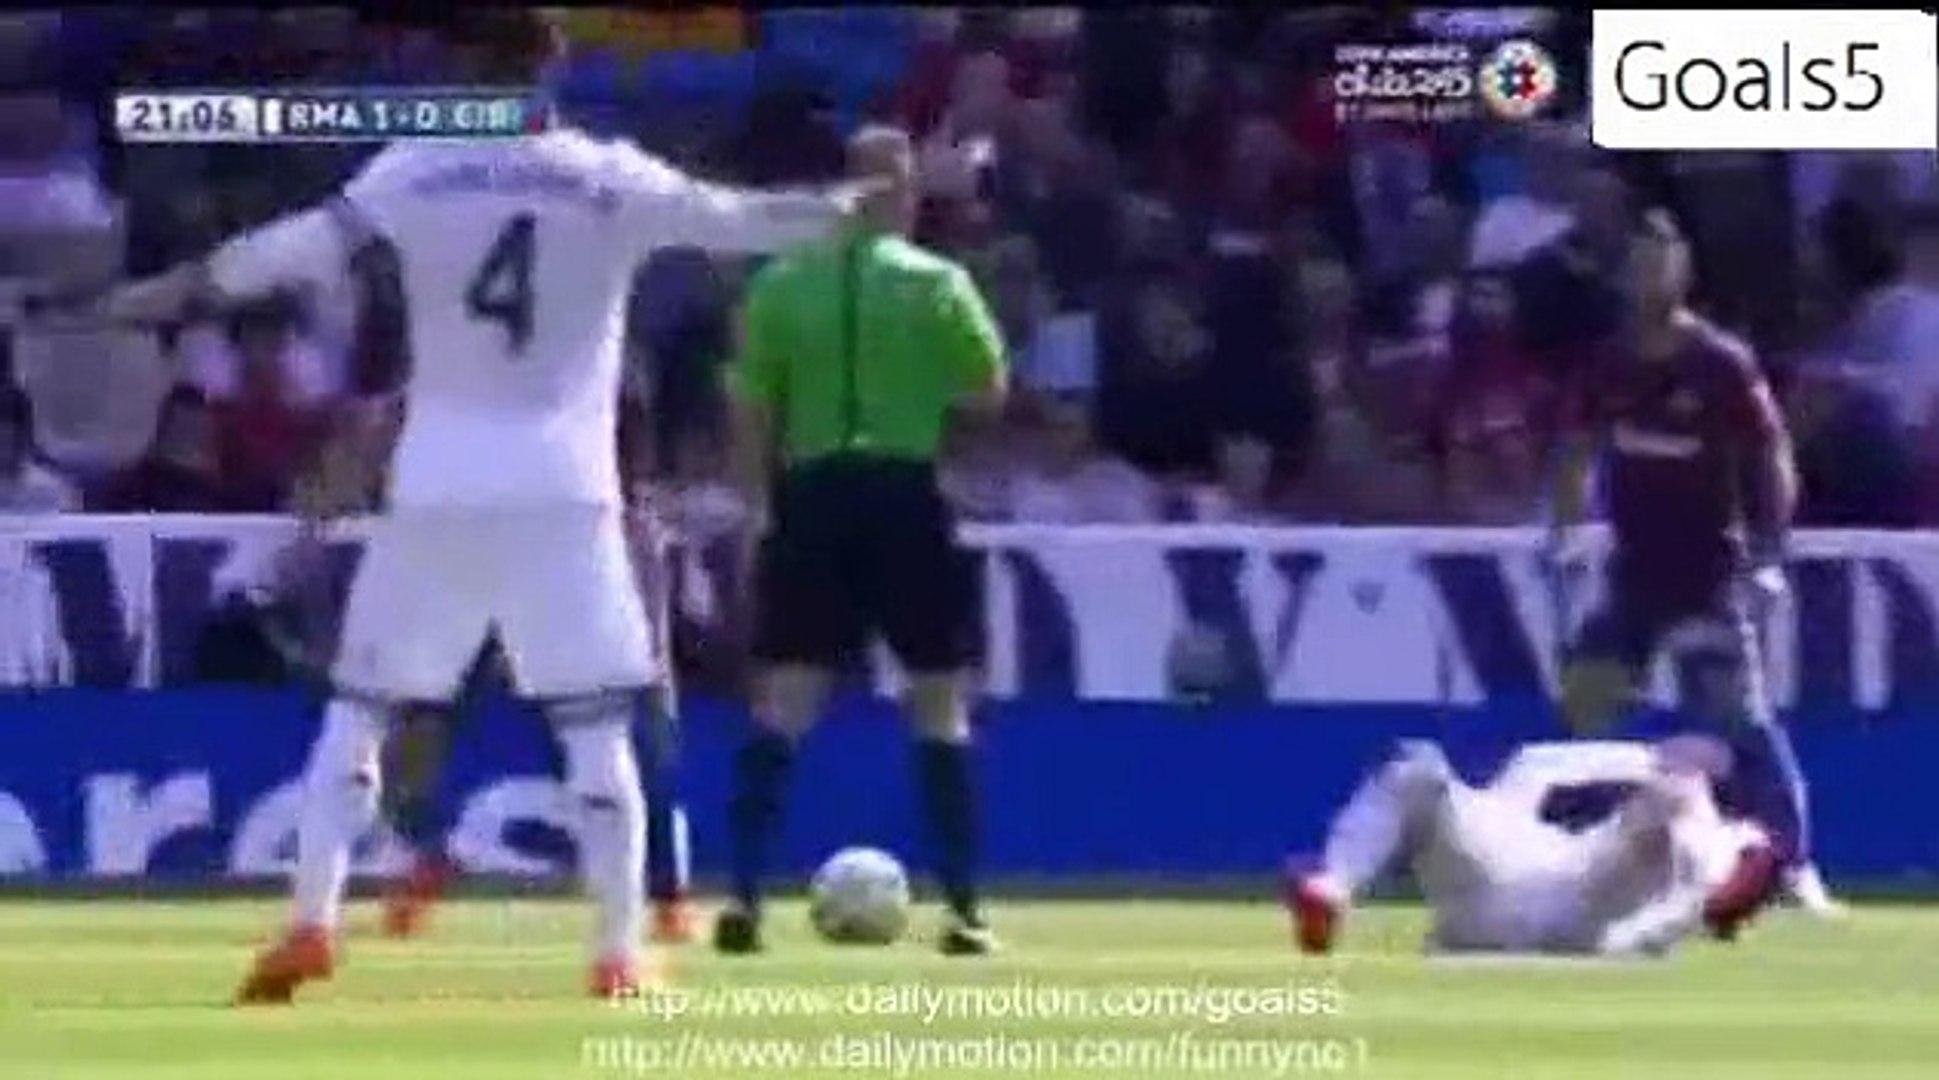 Real Madrid 3 - 0 Eibar All Goals and Highlights La Liga 11-4-2015